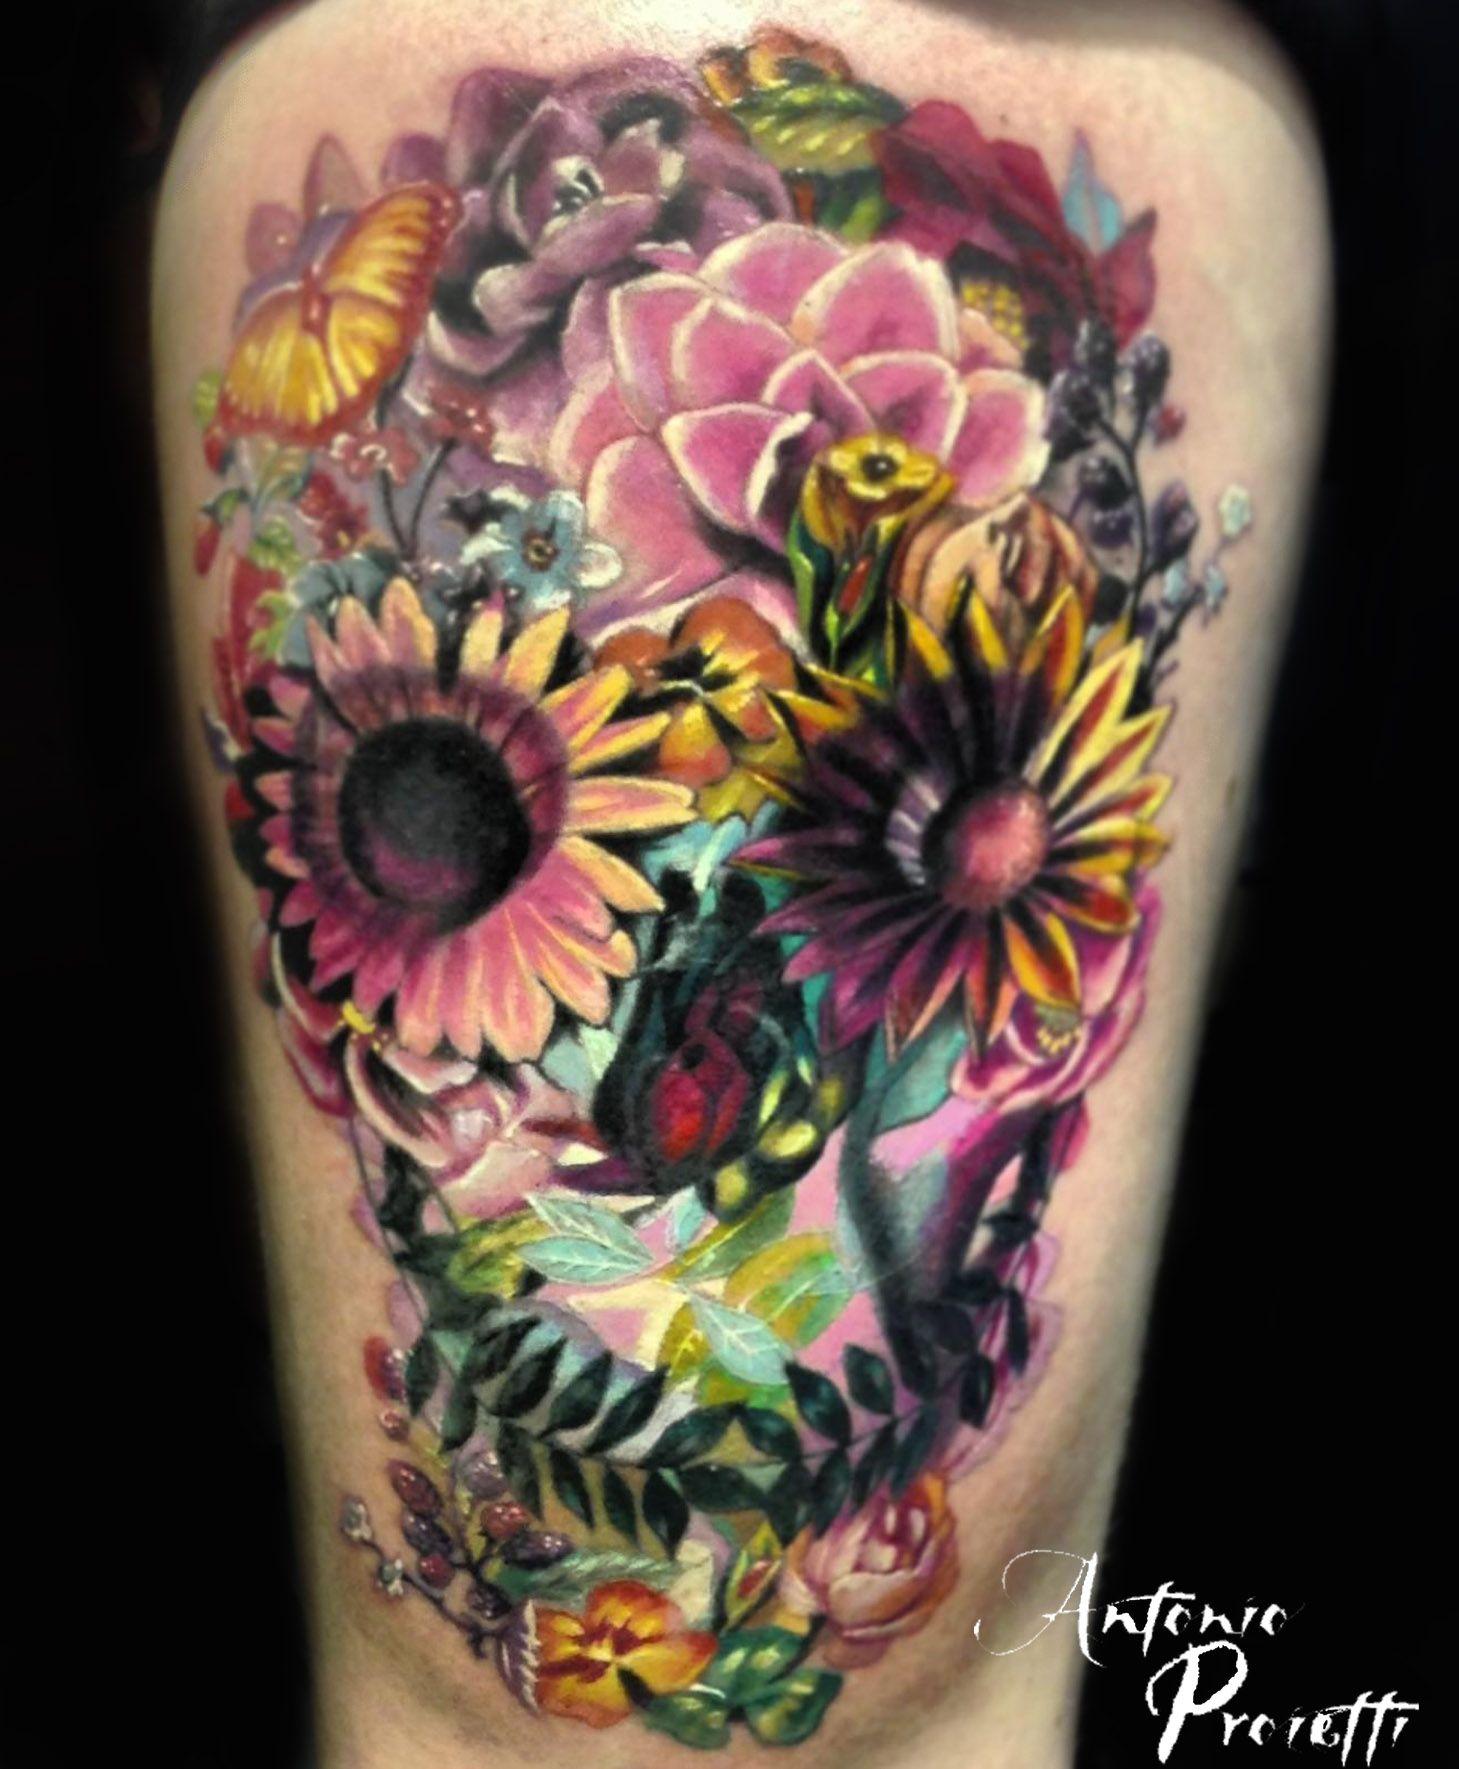 Antonio proietti mexican skull camdentown tattoo studio for Skull and flowers tattoos